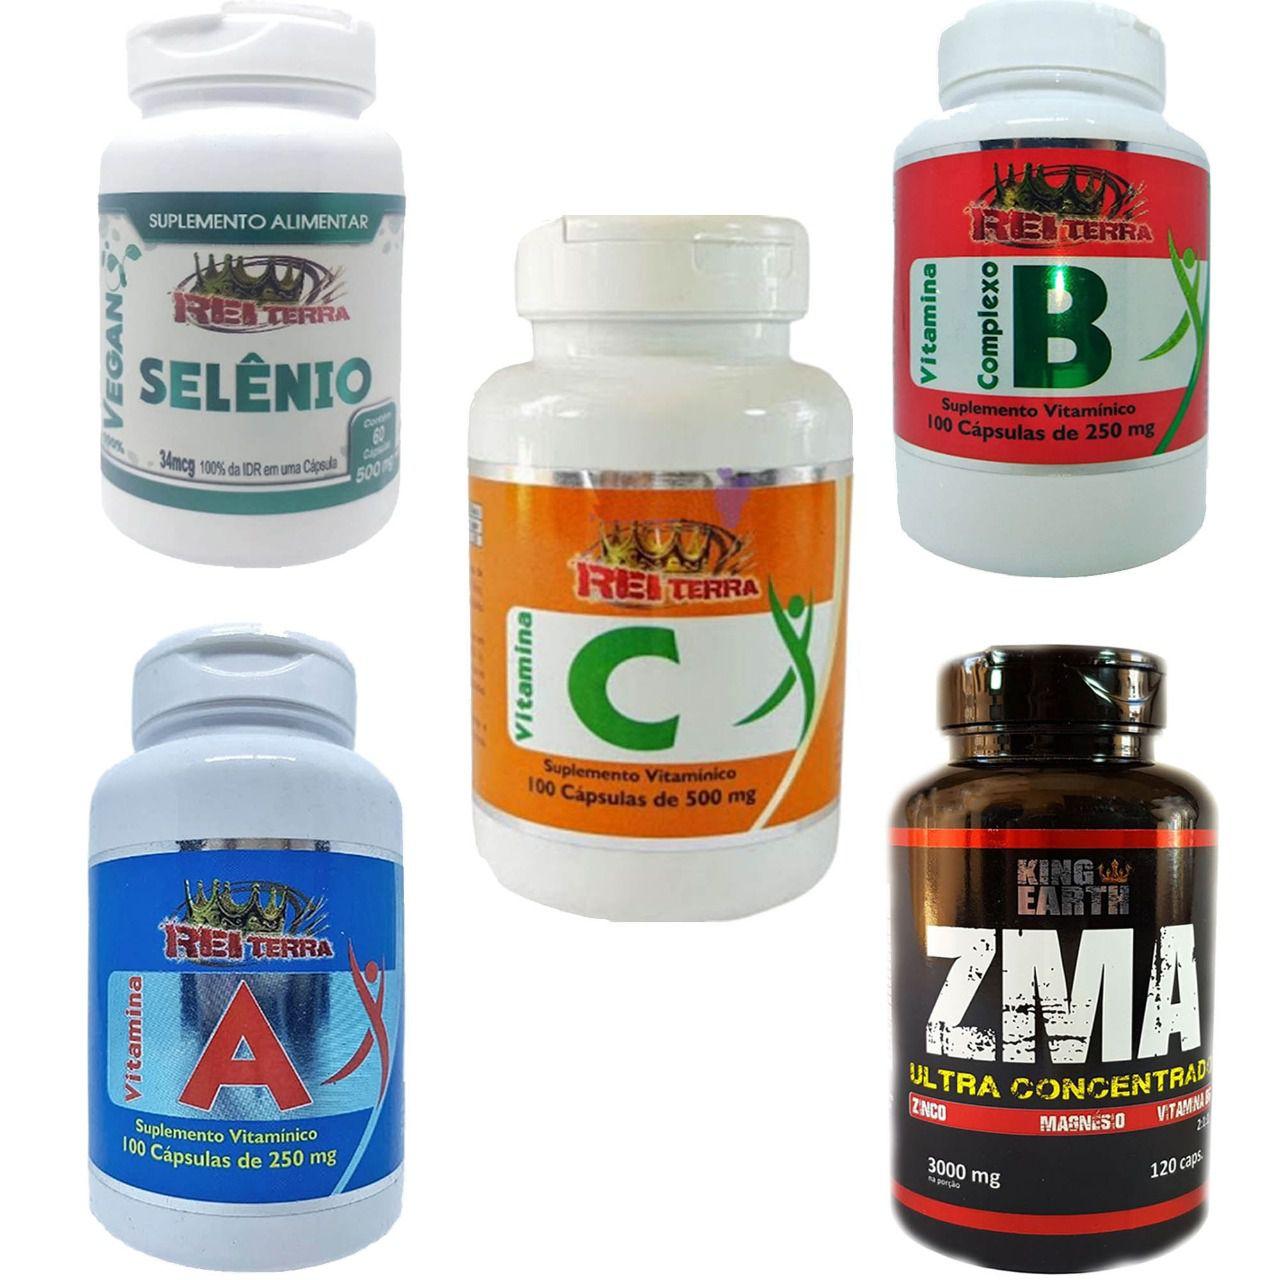 Kit Imunidade Selênio + Vitamina A + Vitamina C + Complexo B + Zma